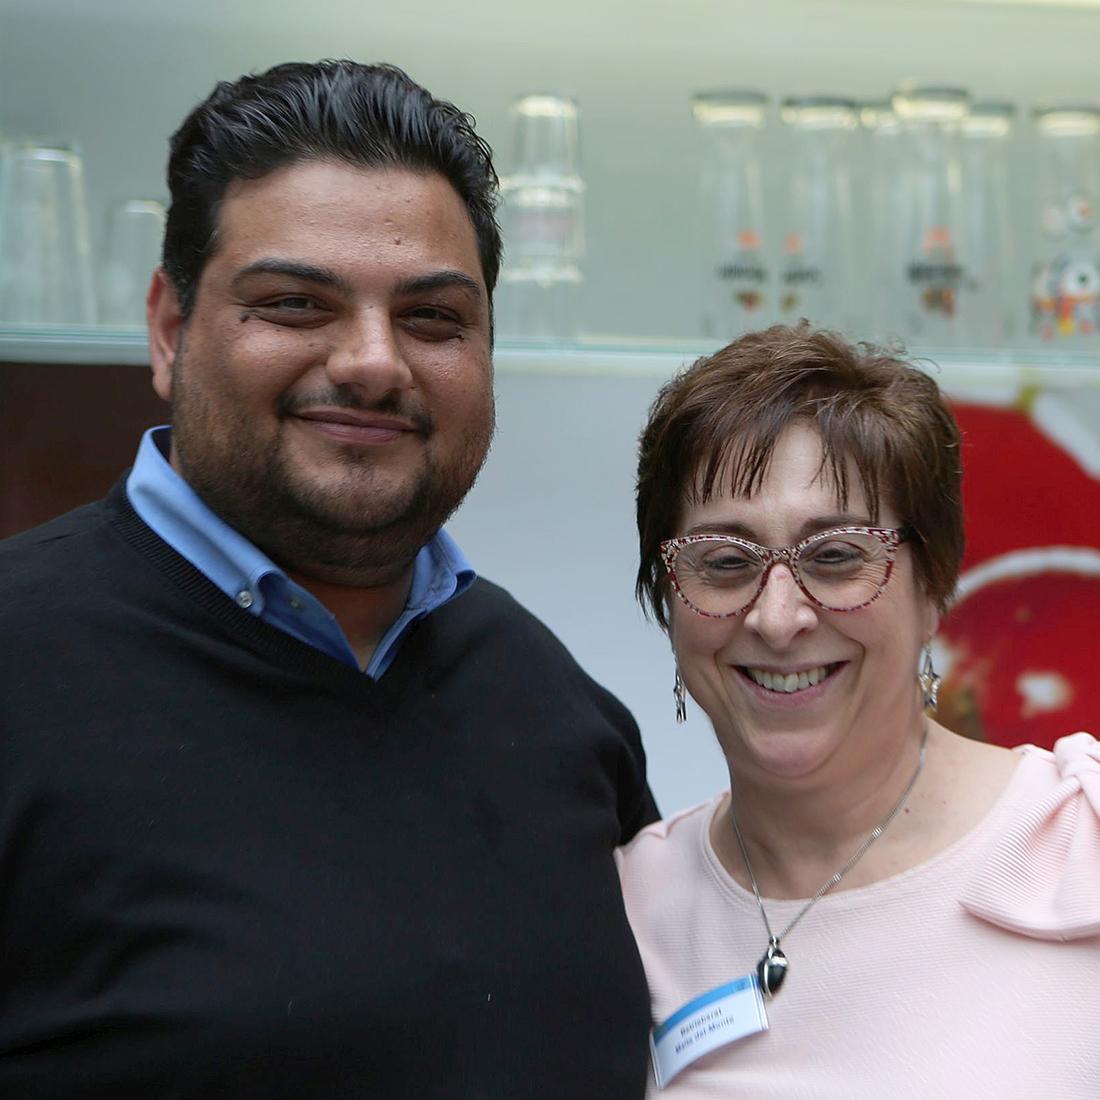 Pedram Navidi und Maria Theresa Del Monte auf dem letzten Controlware Kick-off im Mai 2019.